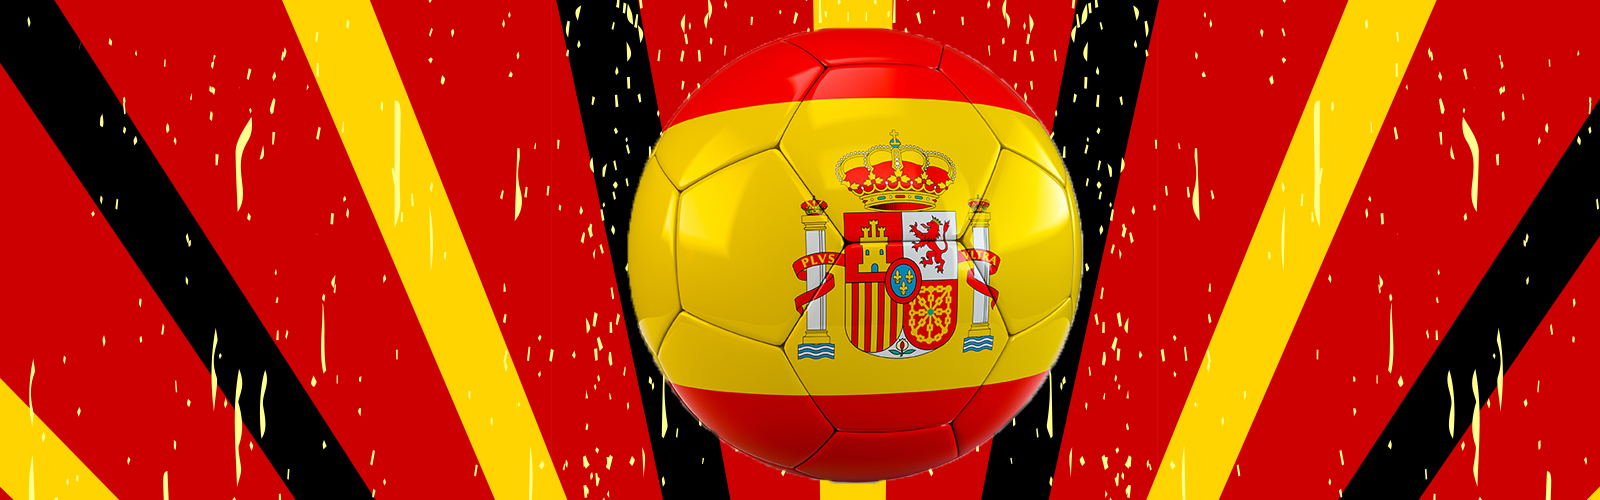 Spaansheader